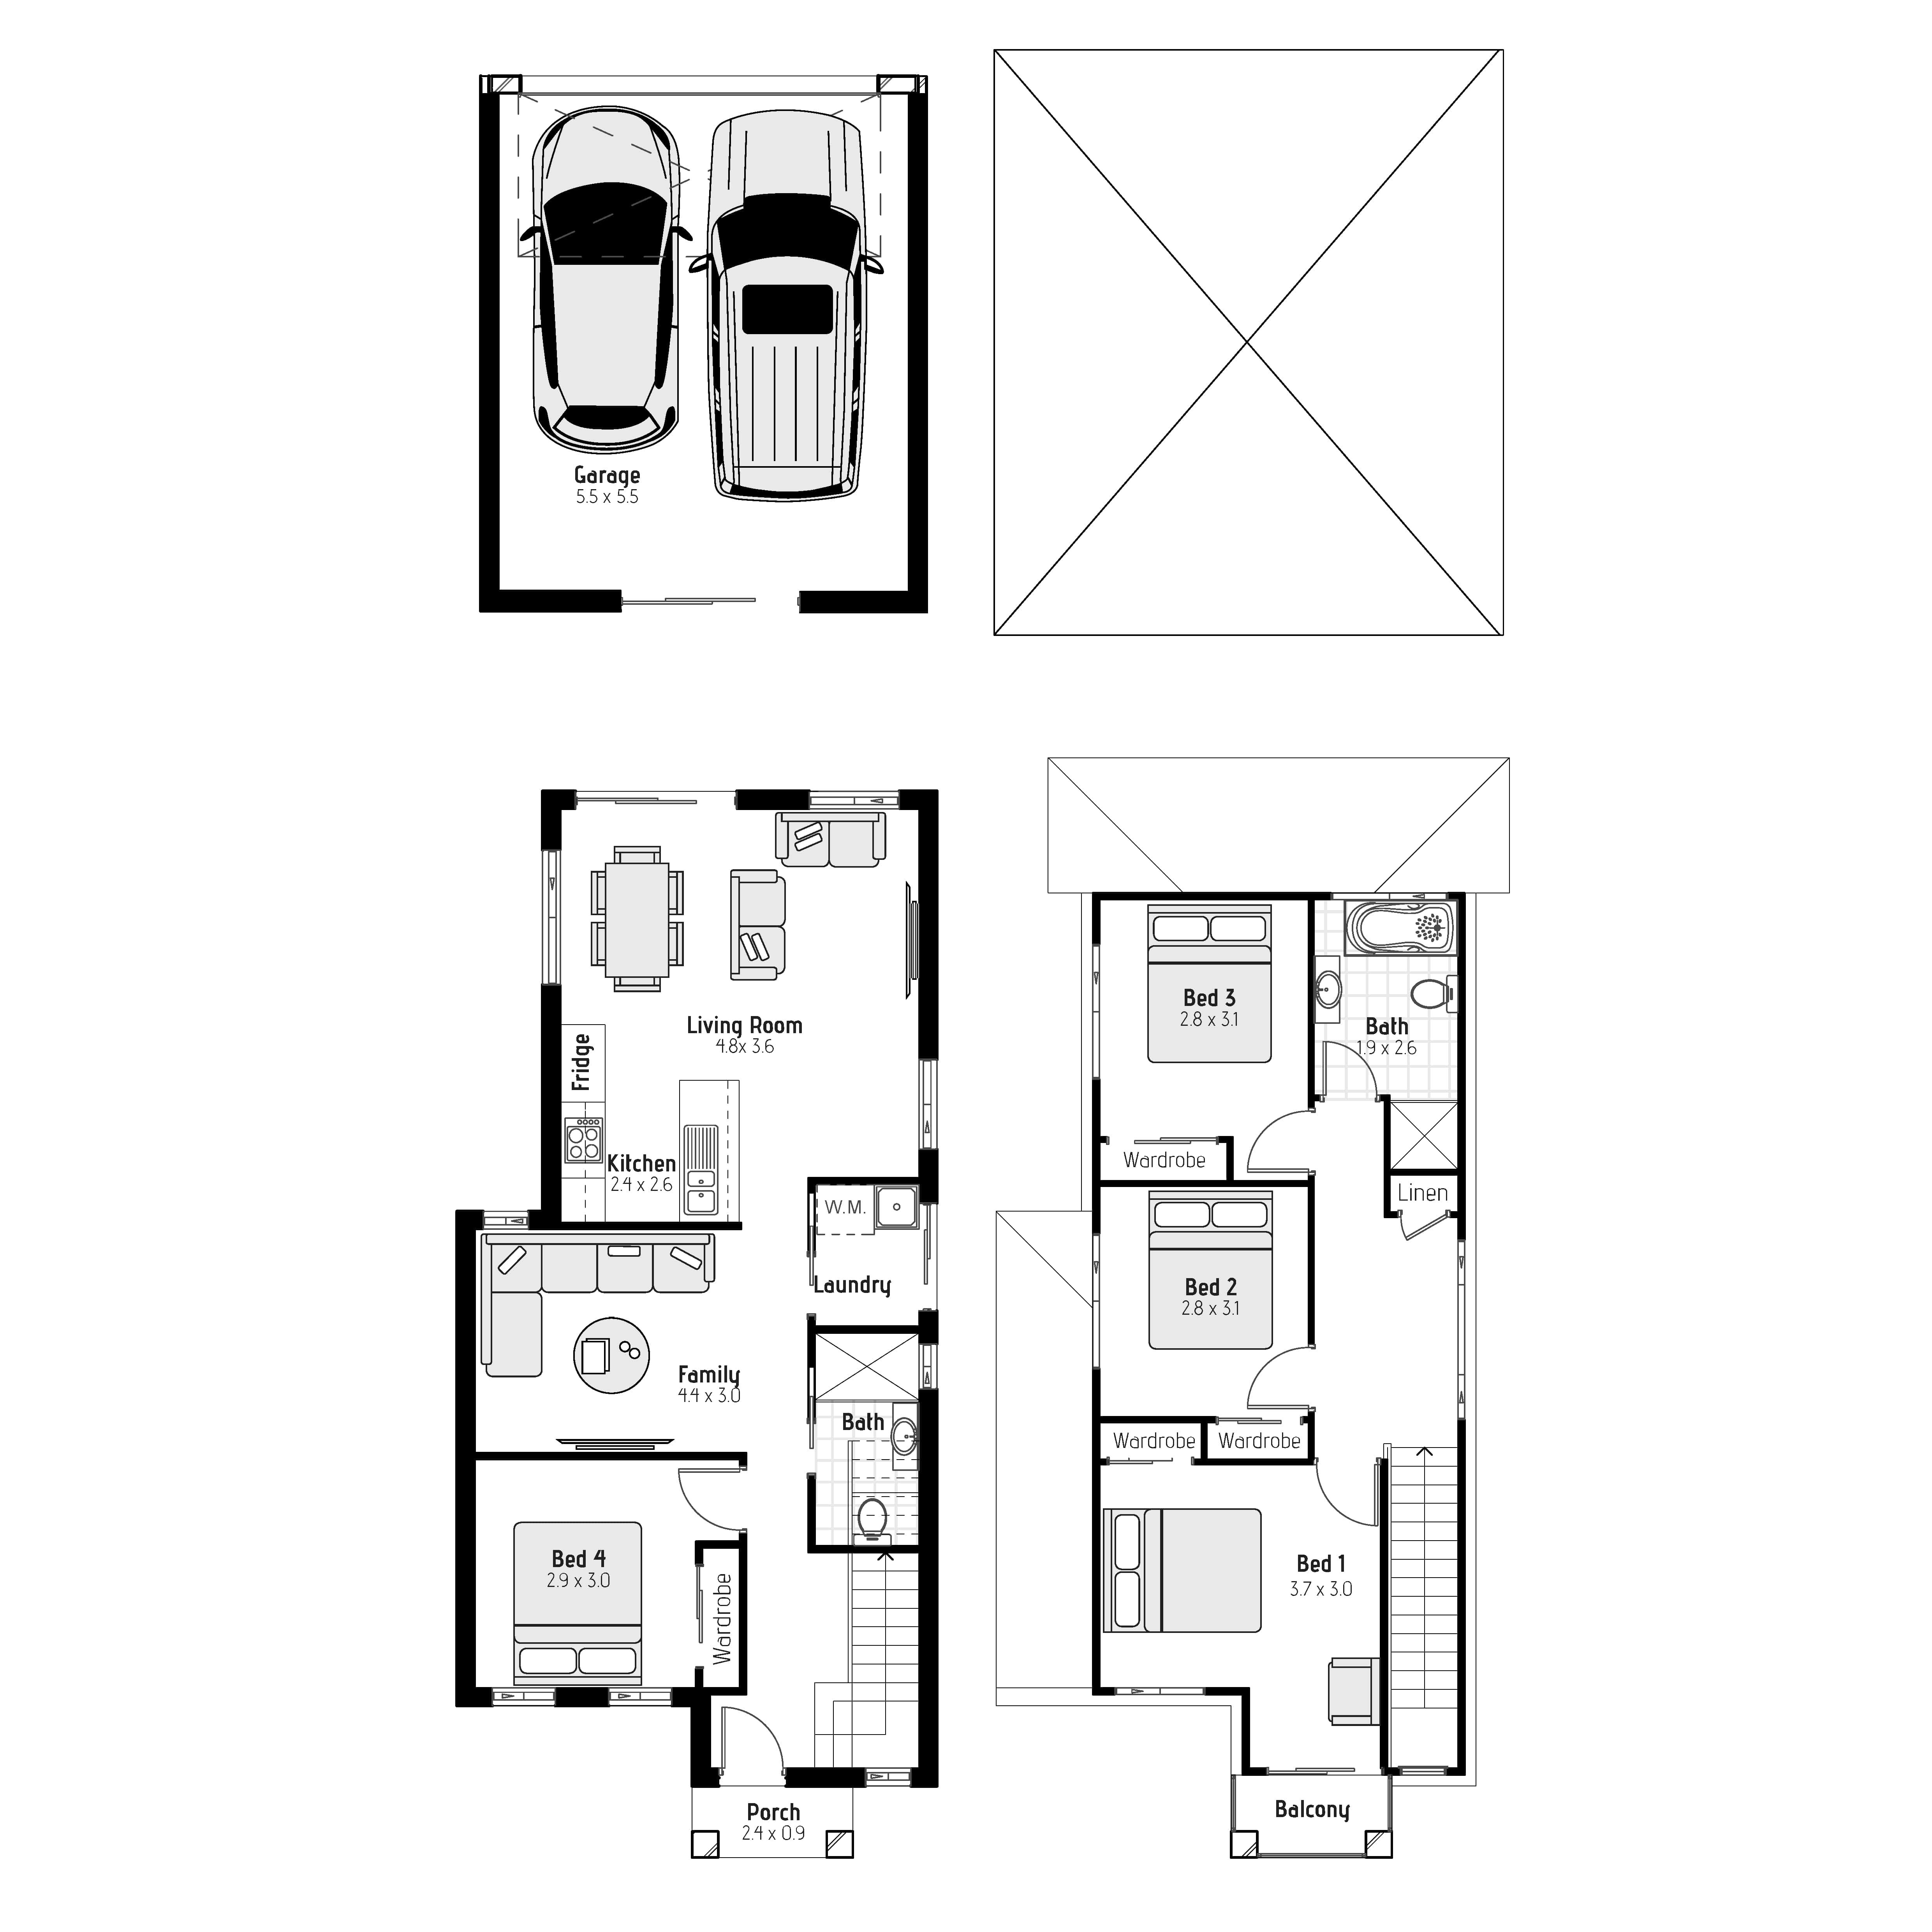 L9469251 AUSTRAL NSW 2179 - Floor plan